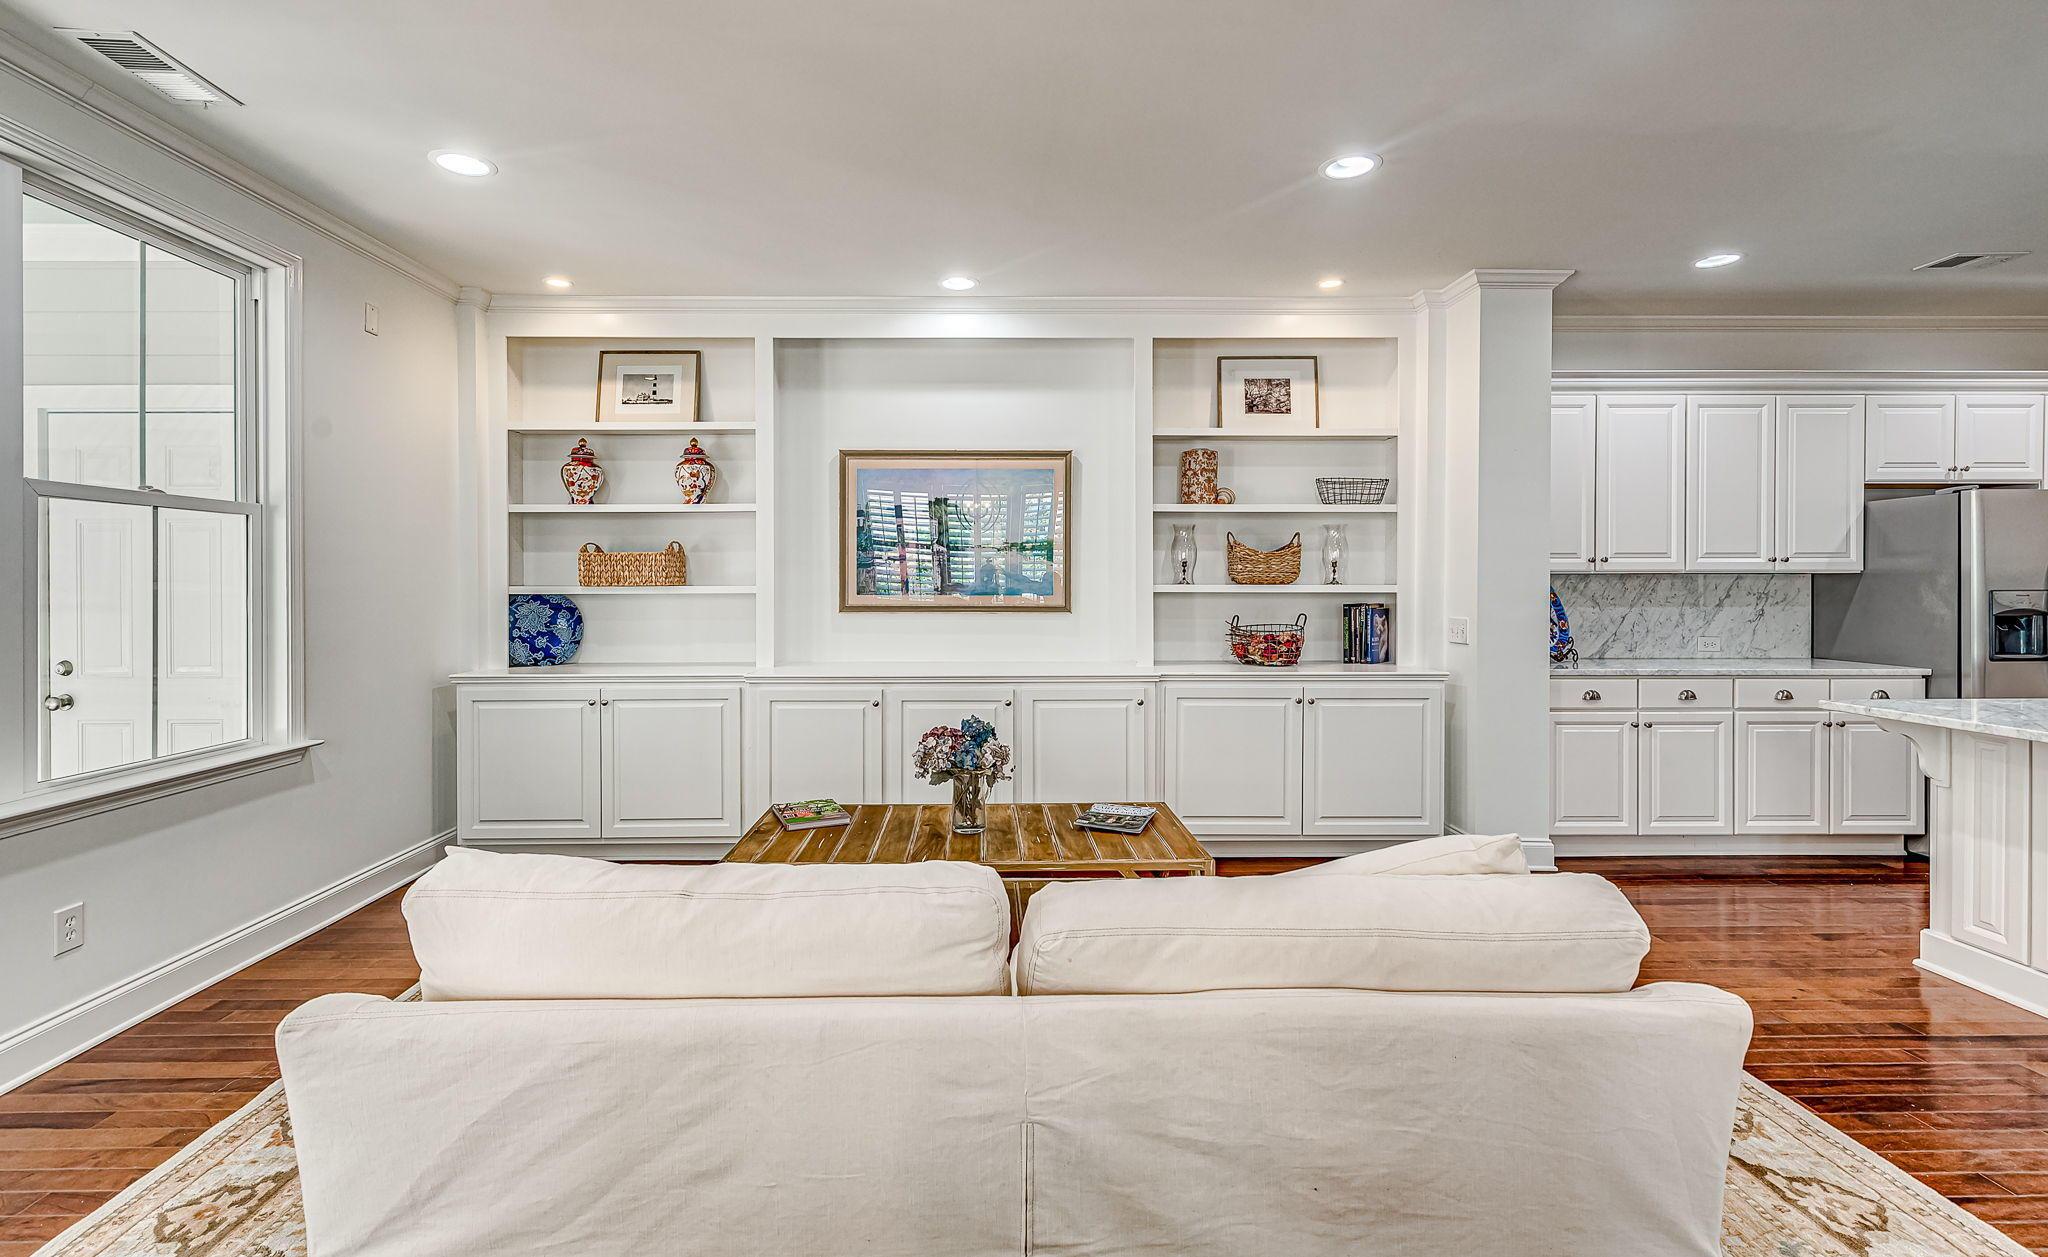 Dunes West Homes For Sale - 2476 Kings Gate, Mount Pleasant, SC - 42